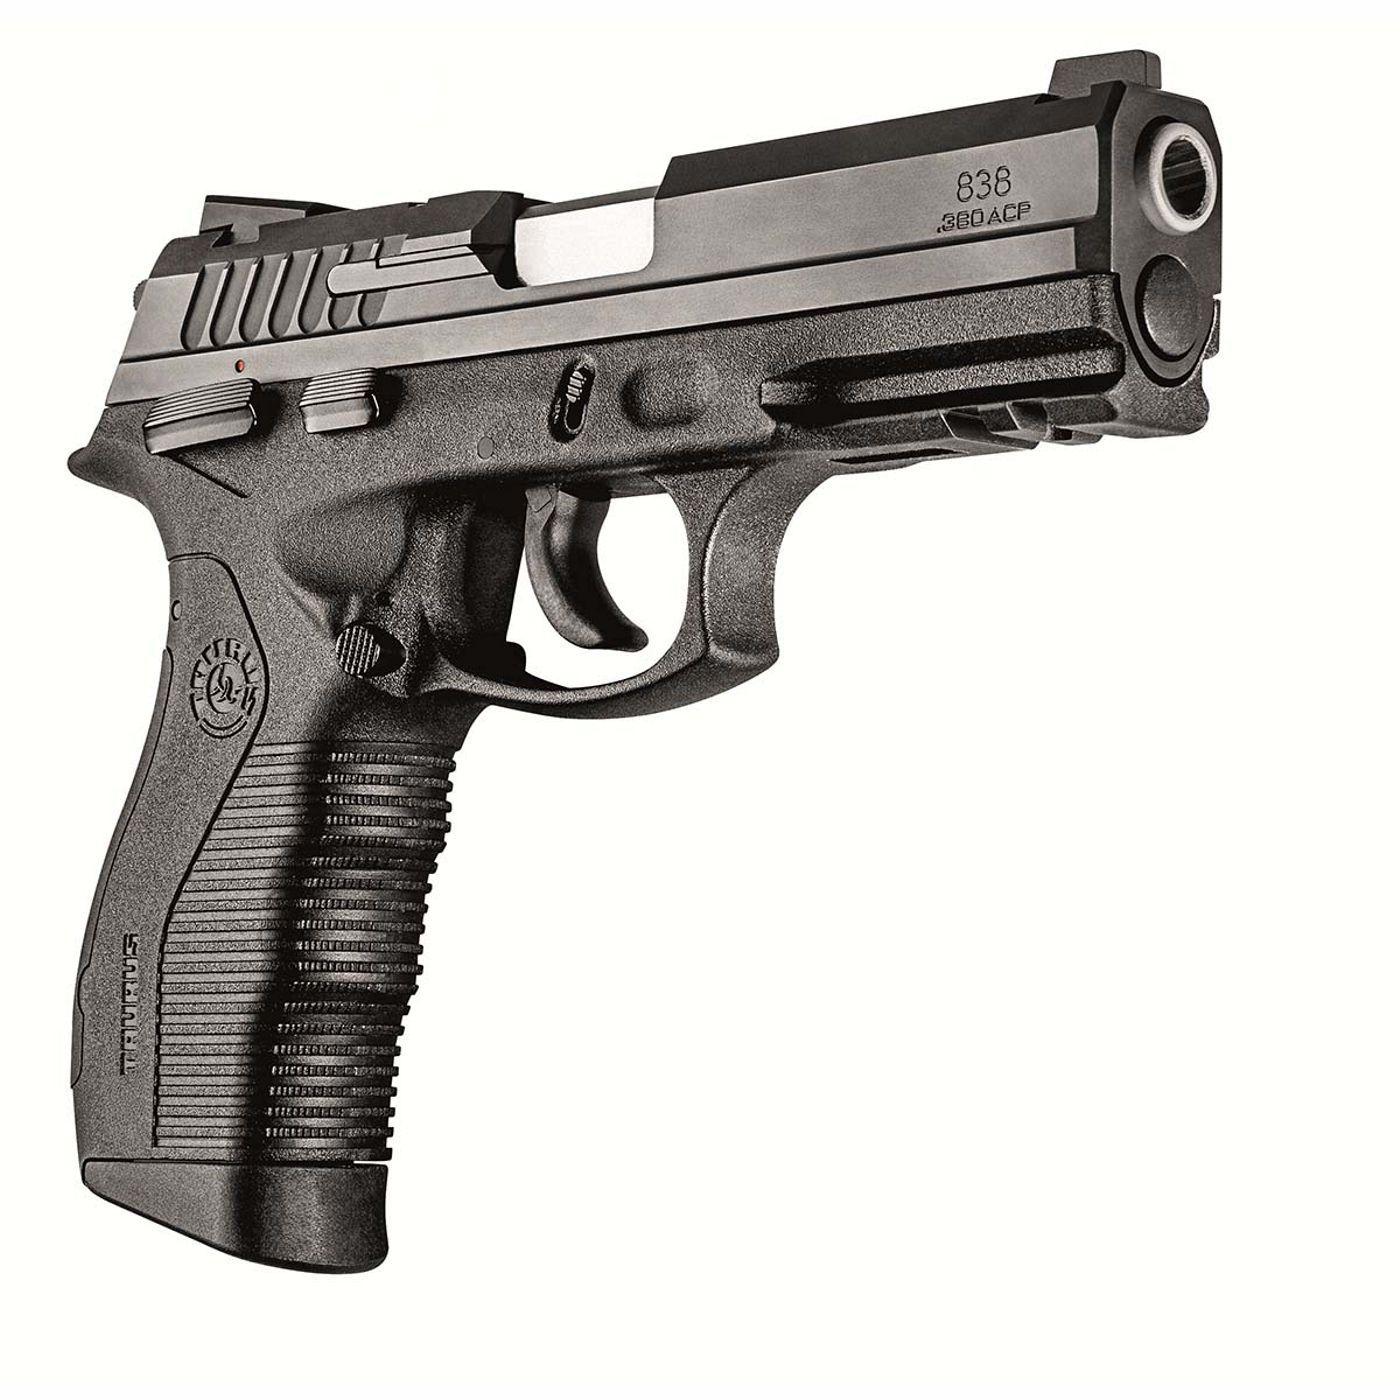 Pistola Taurus 838 - Cal. 380 ACP 18+1 Tiros Oxidada